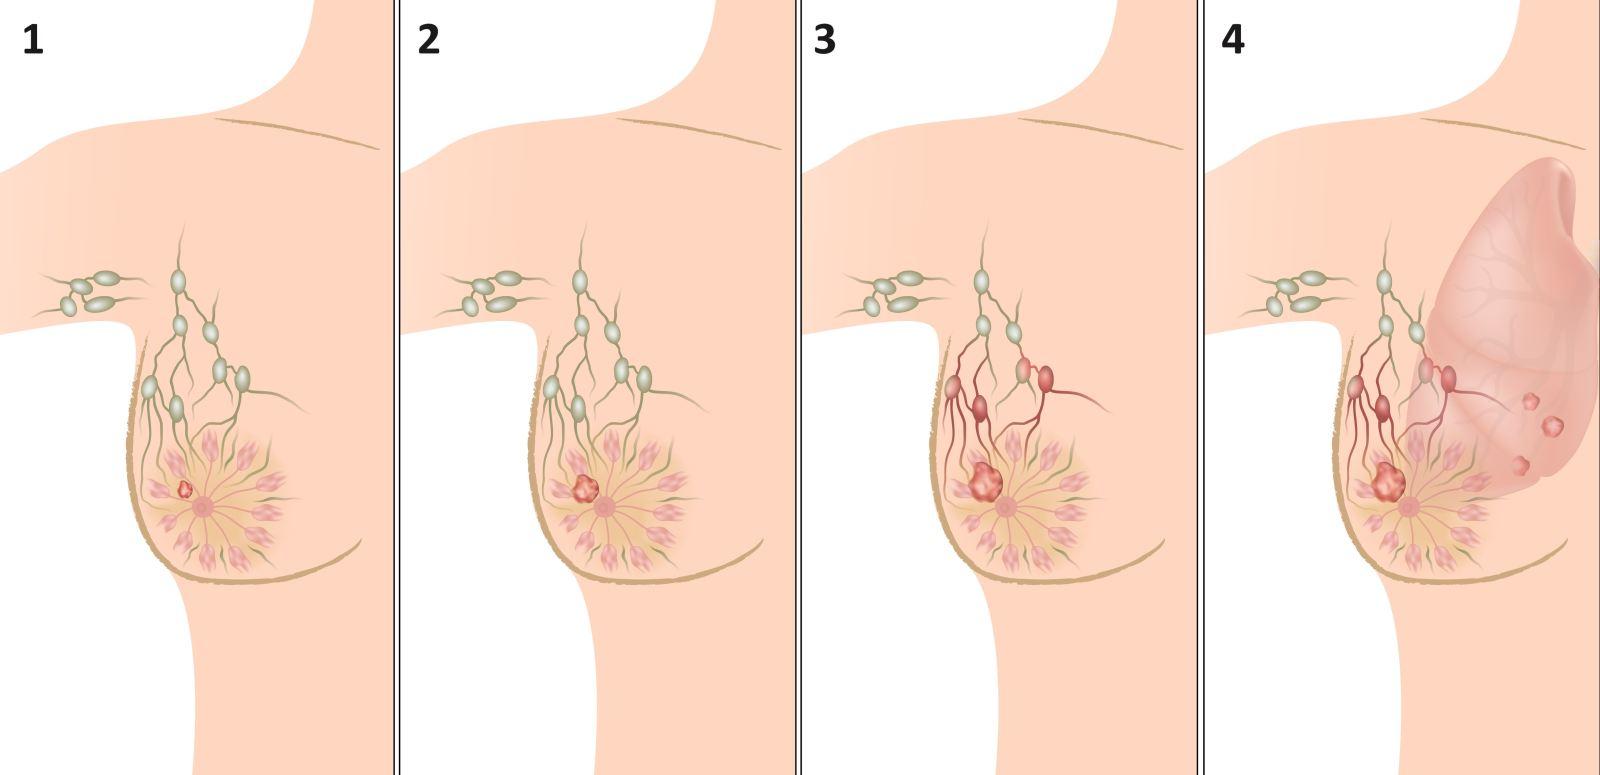 секс как метод профилактики рака молочной железы